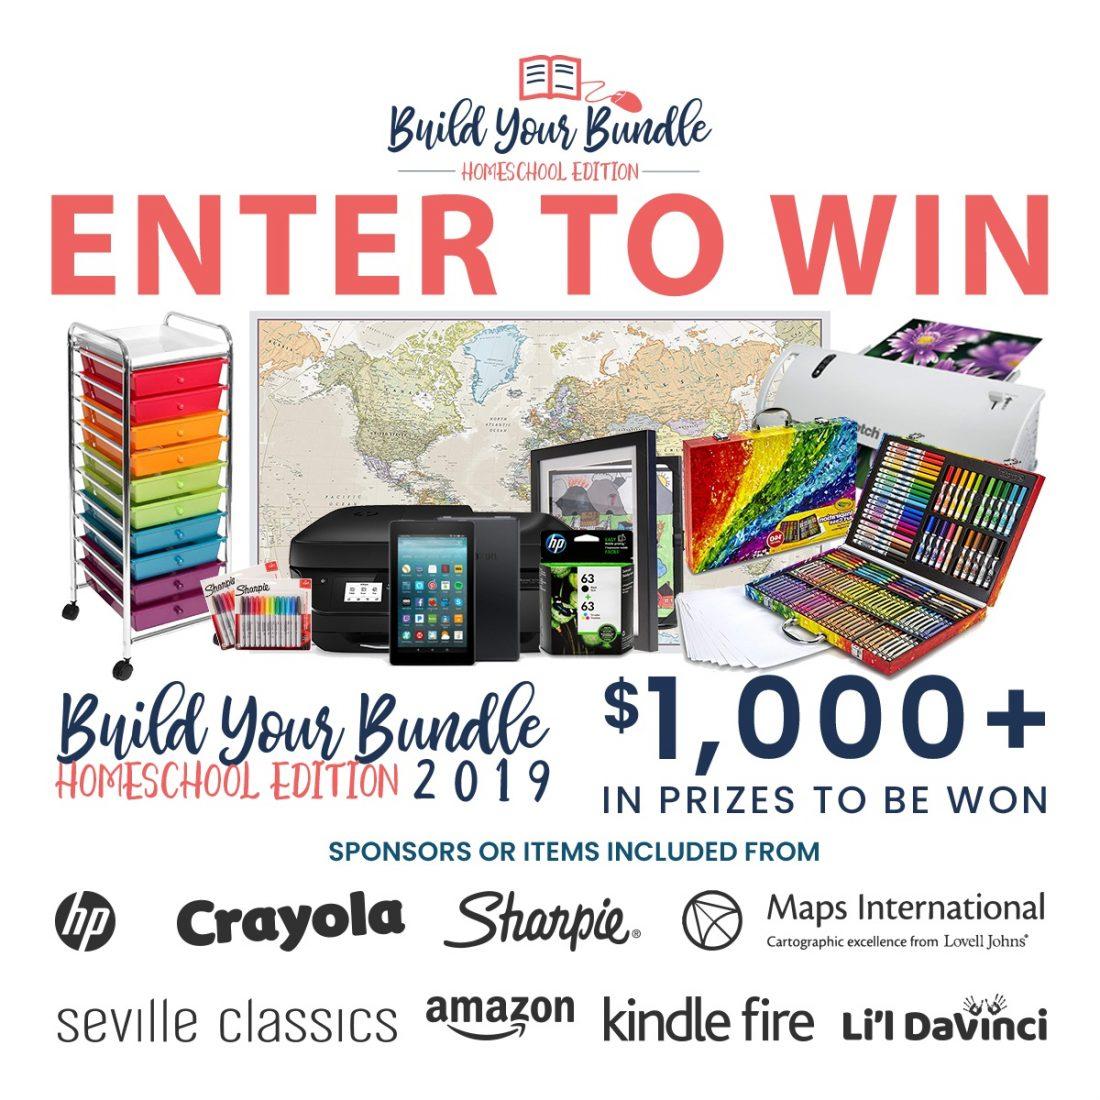 Build Your Bundle Homeschool Giveaway